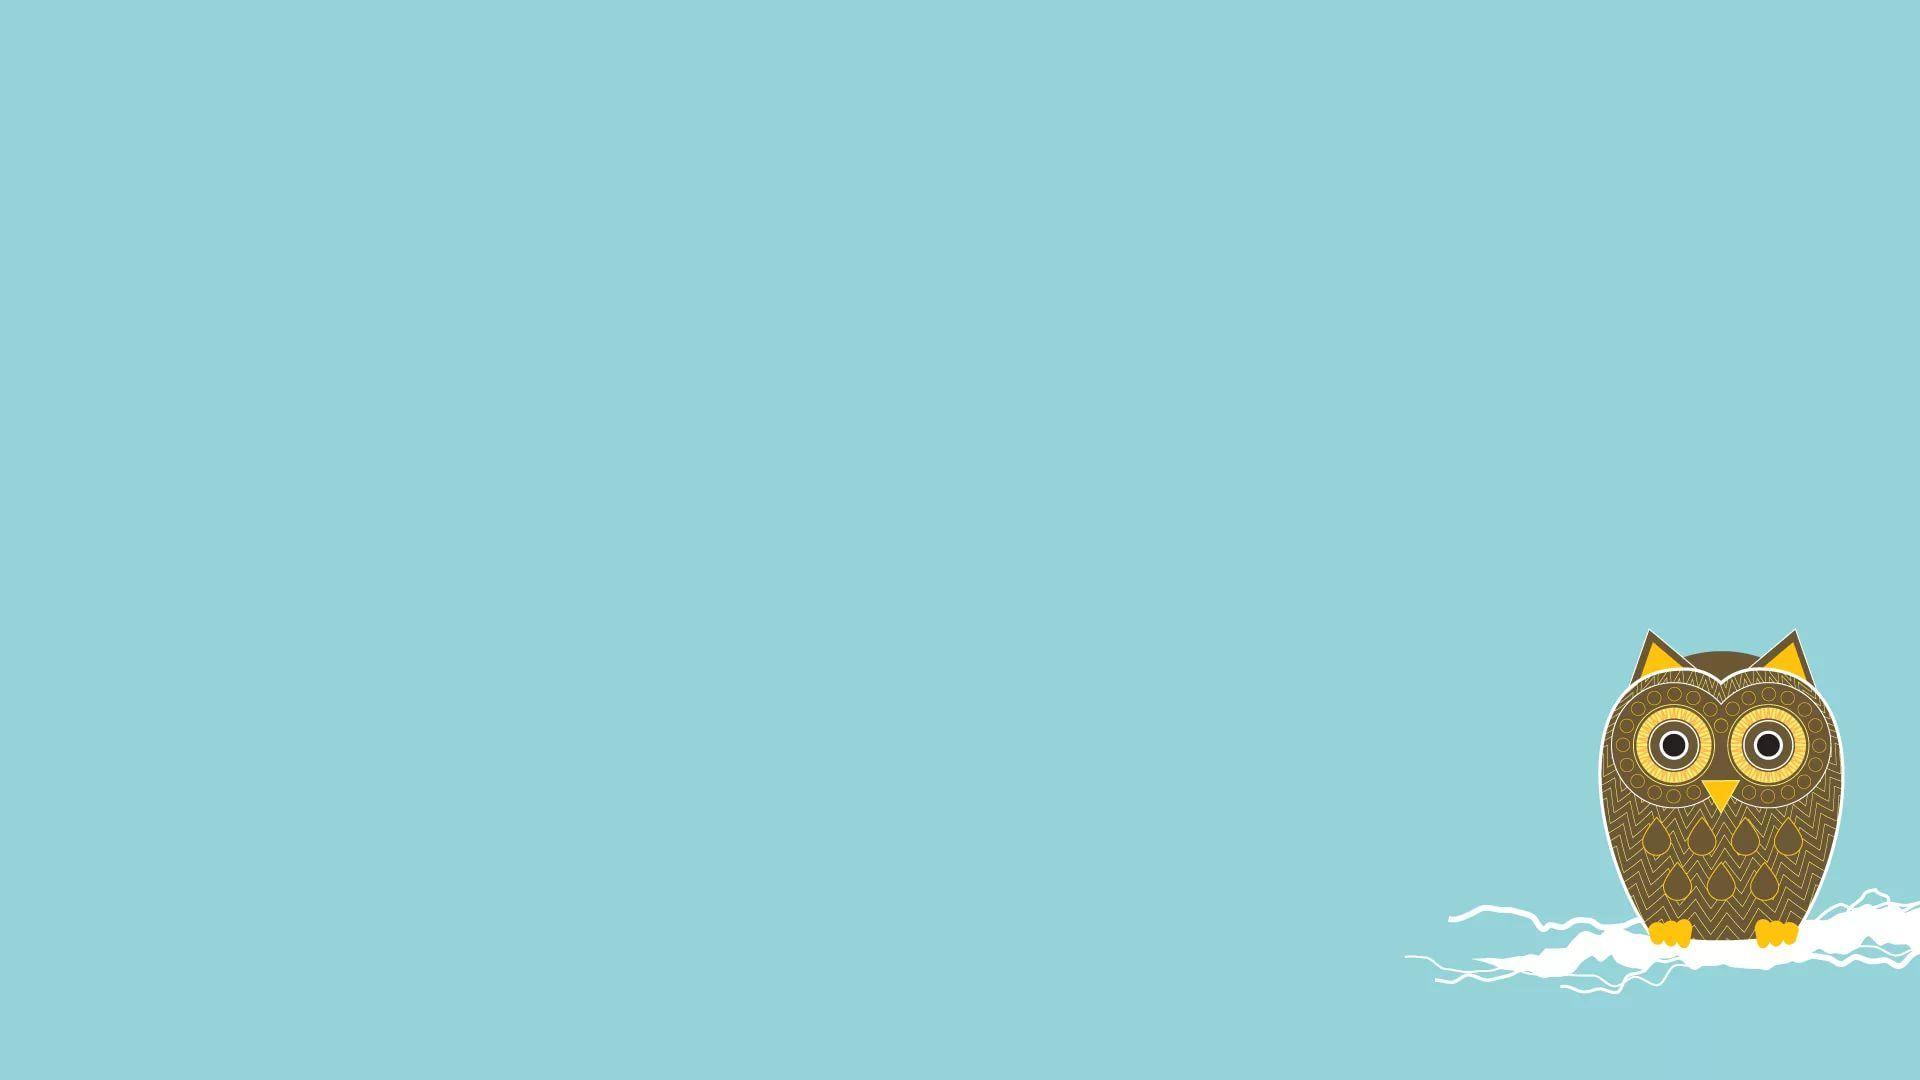 Cute Owl Good Wallpaper